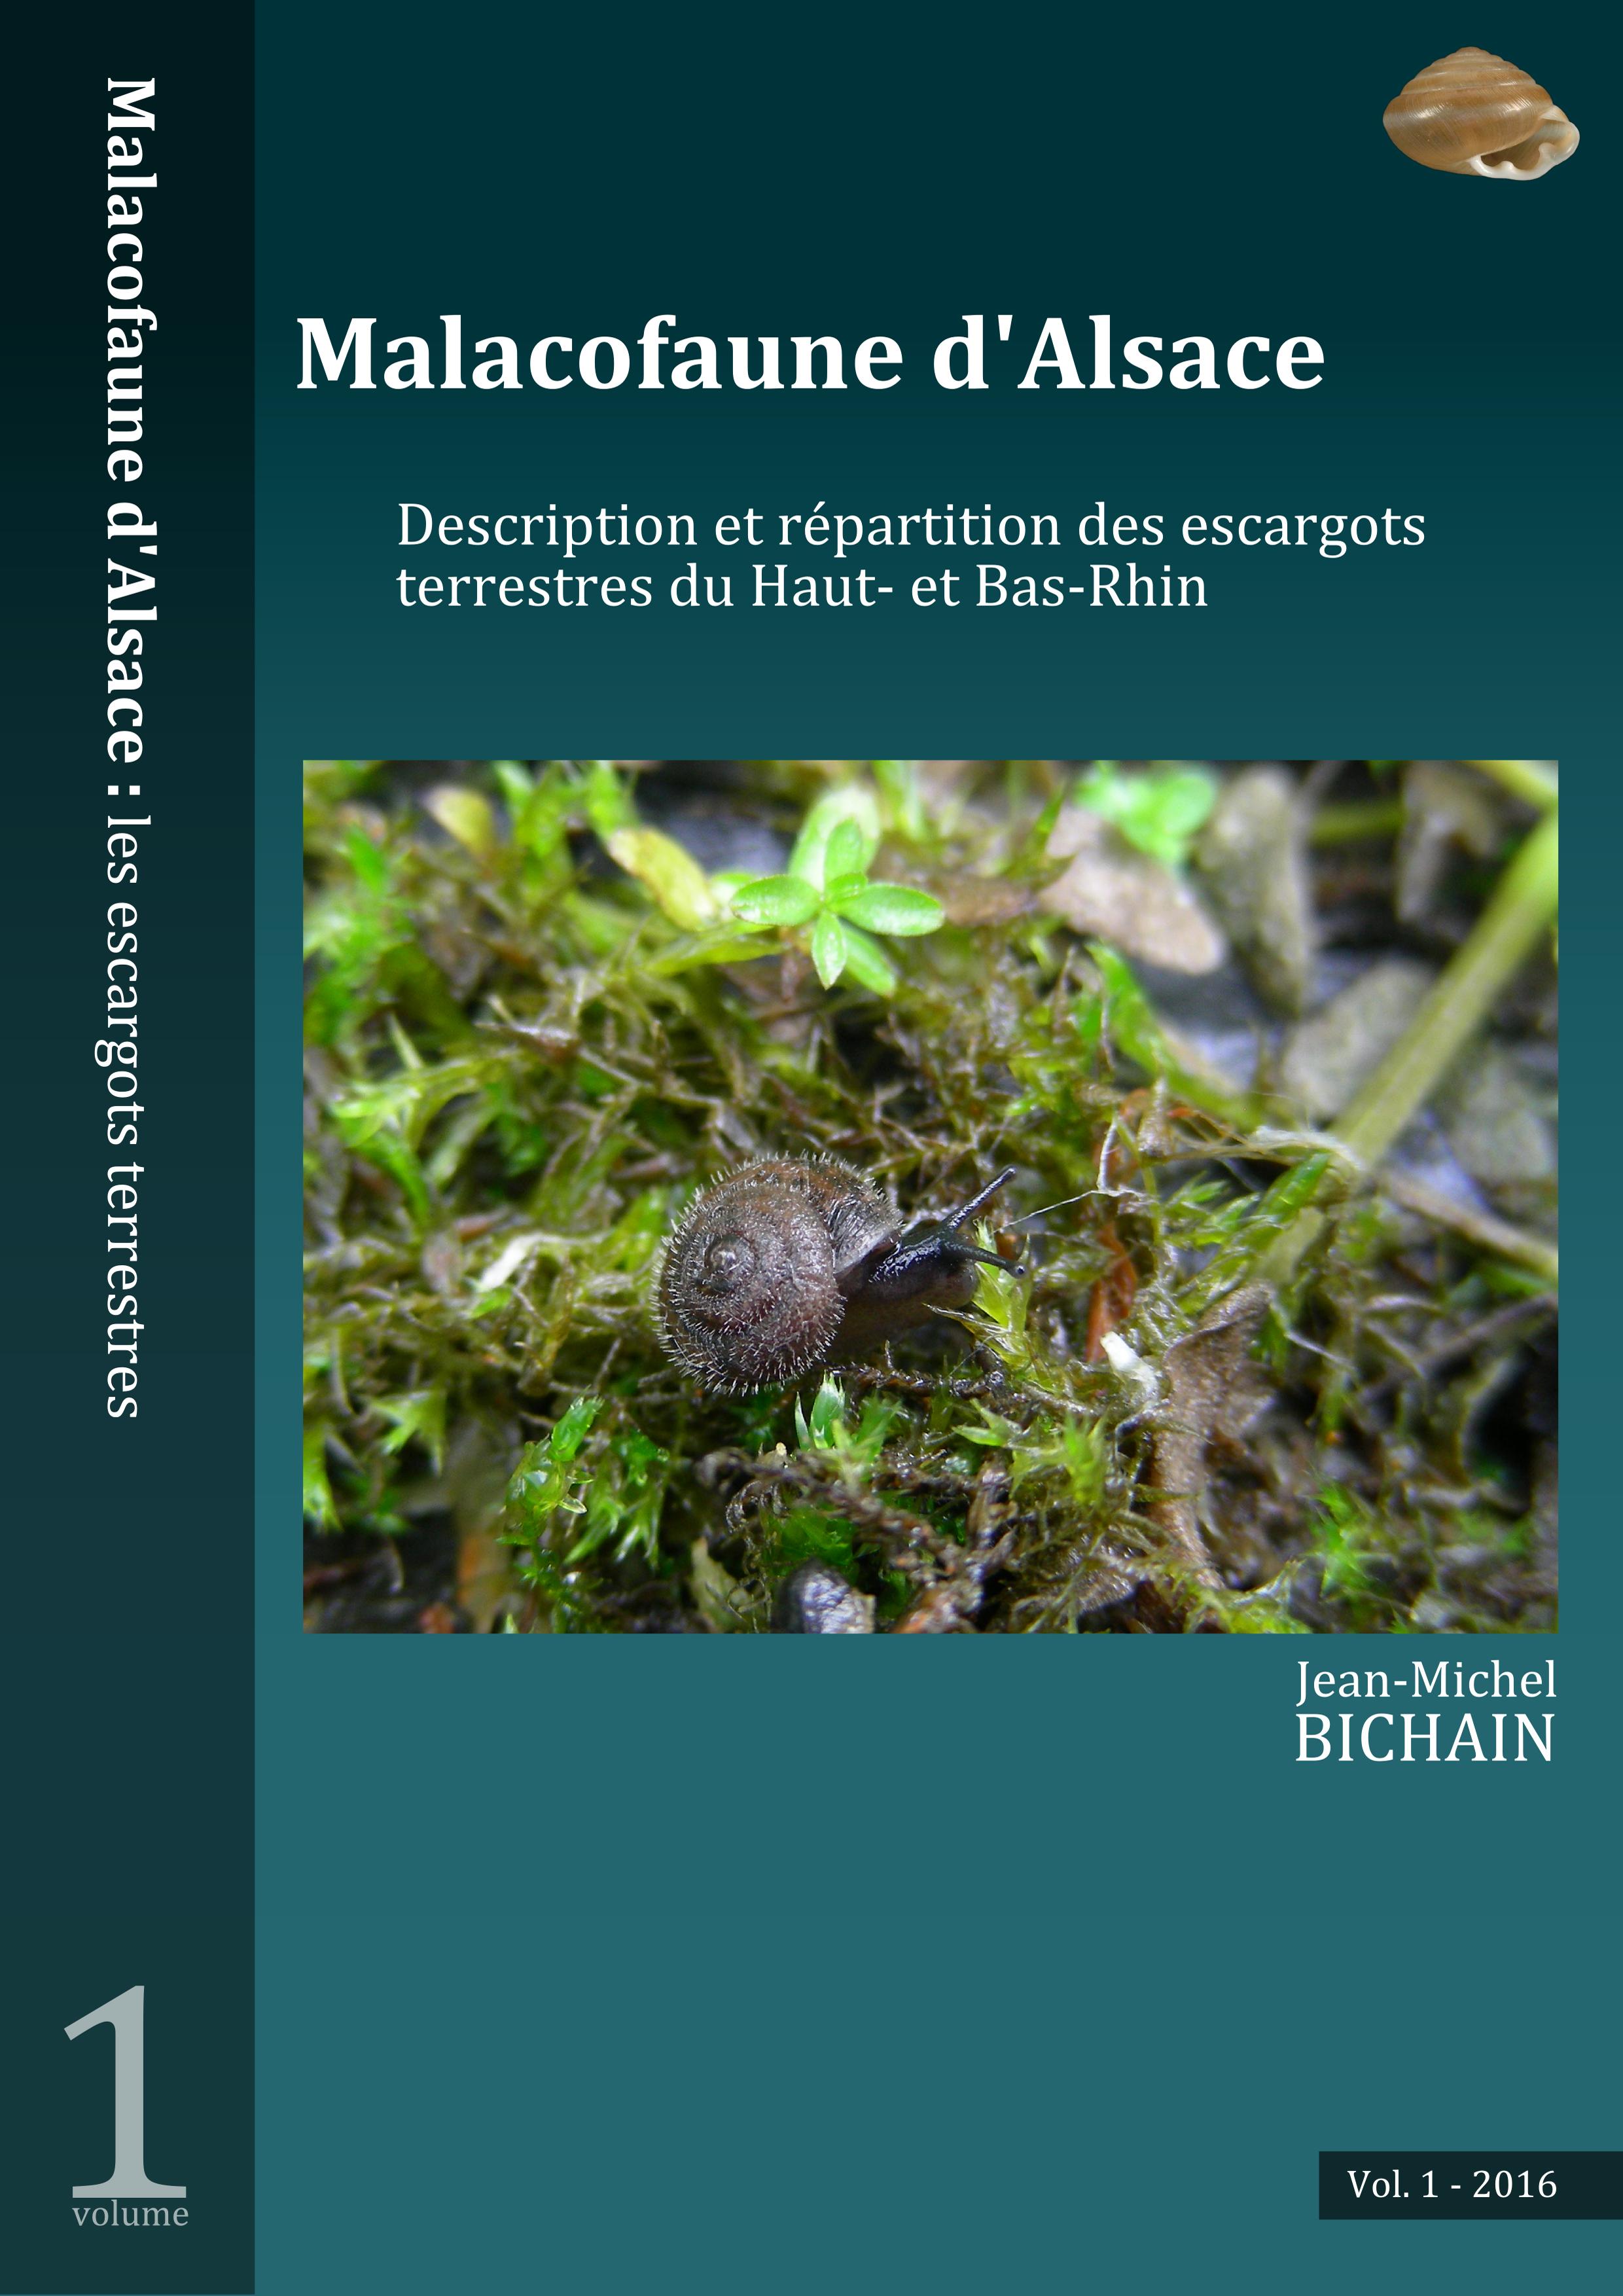 https://cdnfiles2.biolovision.net/www.faune-alsace.org/userfiles/mollusques/escargot2016.jpg